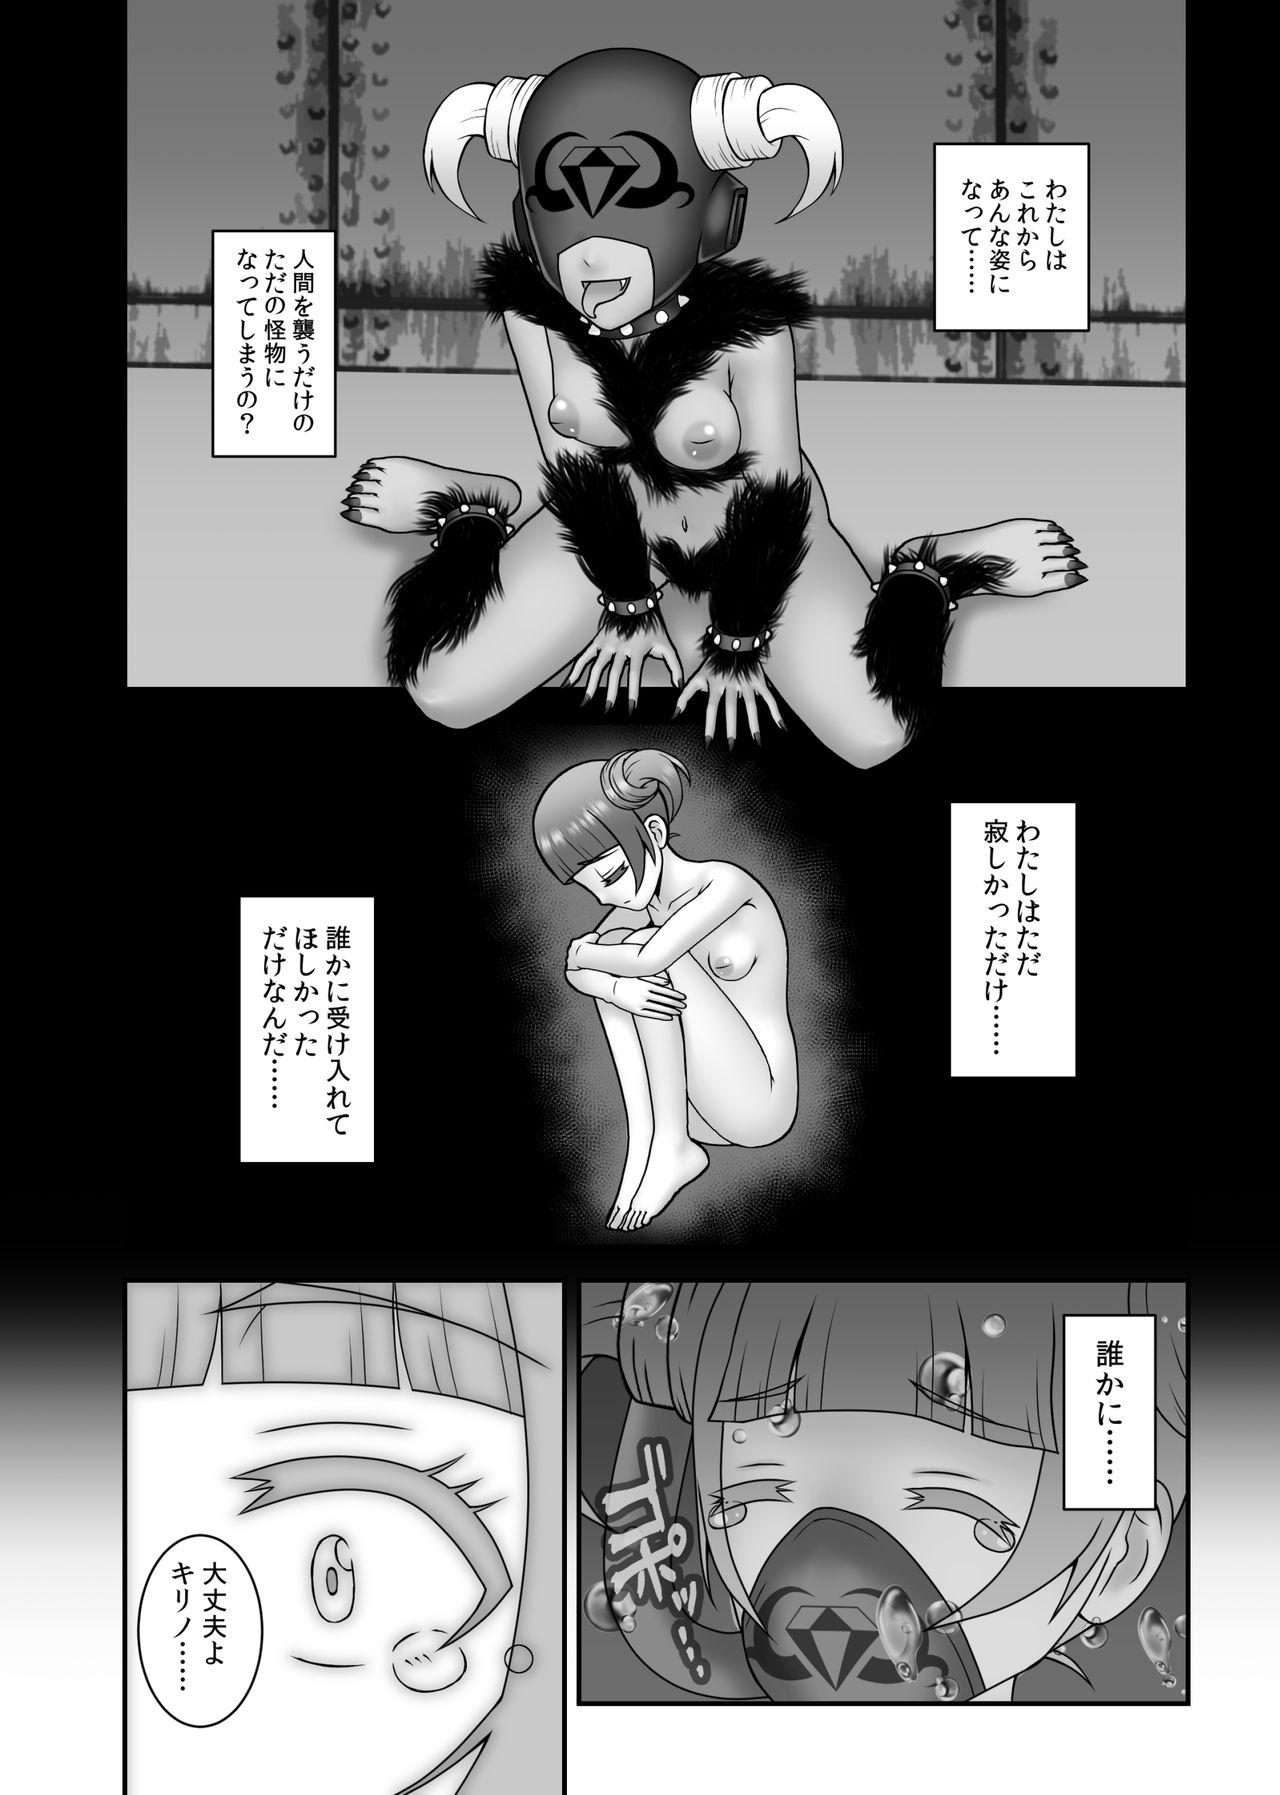 [STUDIO HP+ (IceLee)] Teisou Sentai Virginal Colors Dai-Go-wa 26